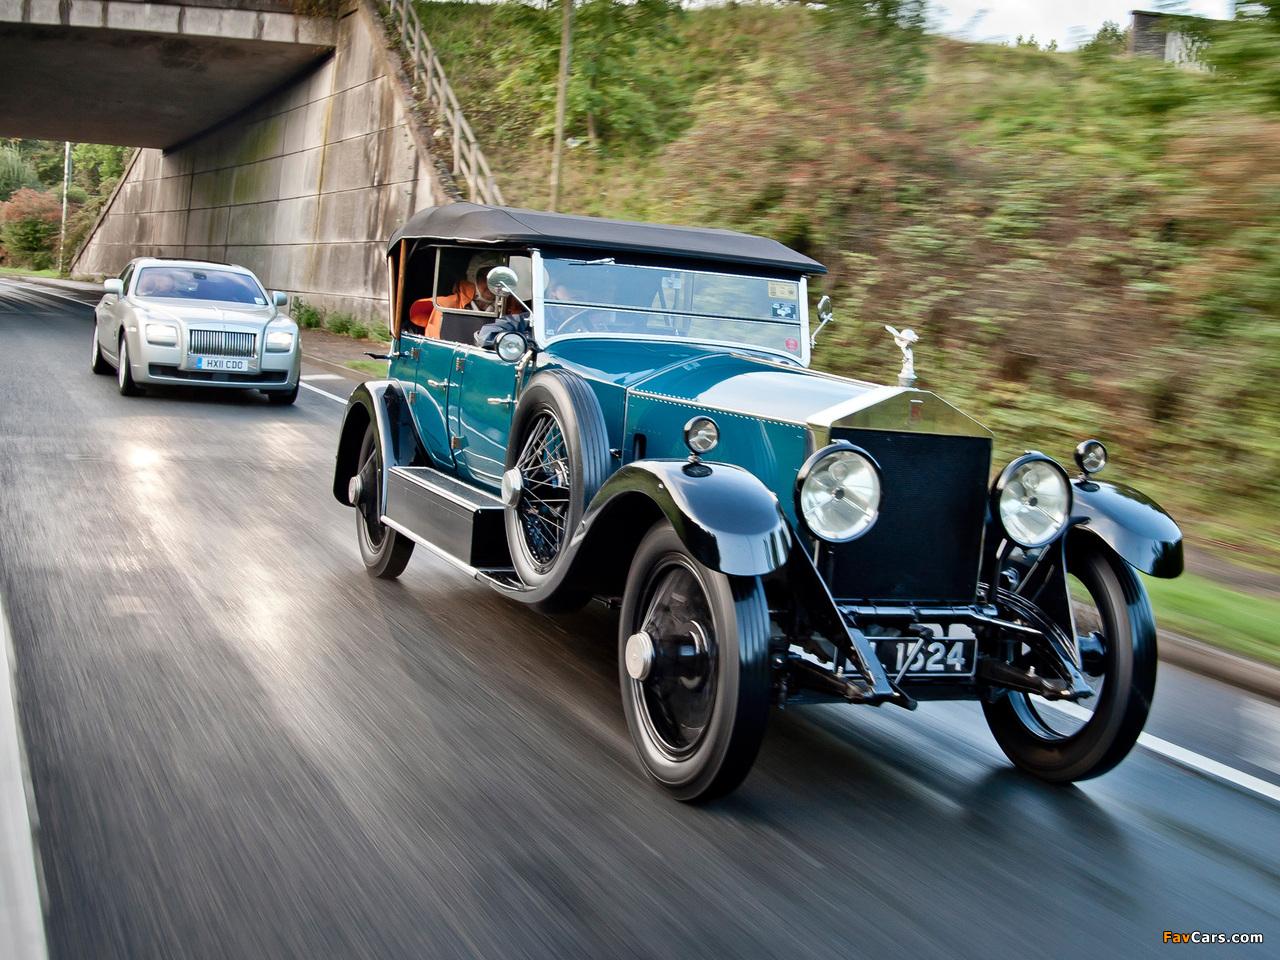 Pictures of Rolls-Royce (1280 x 960)